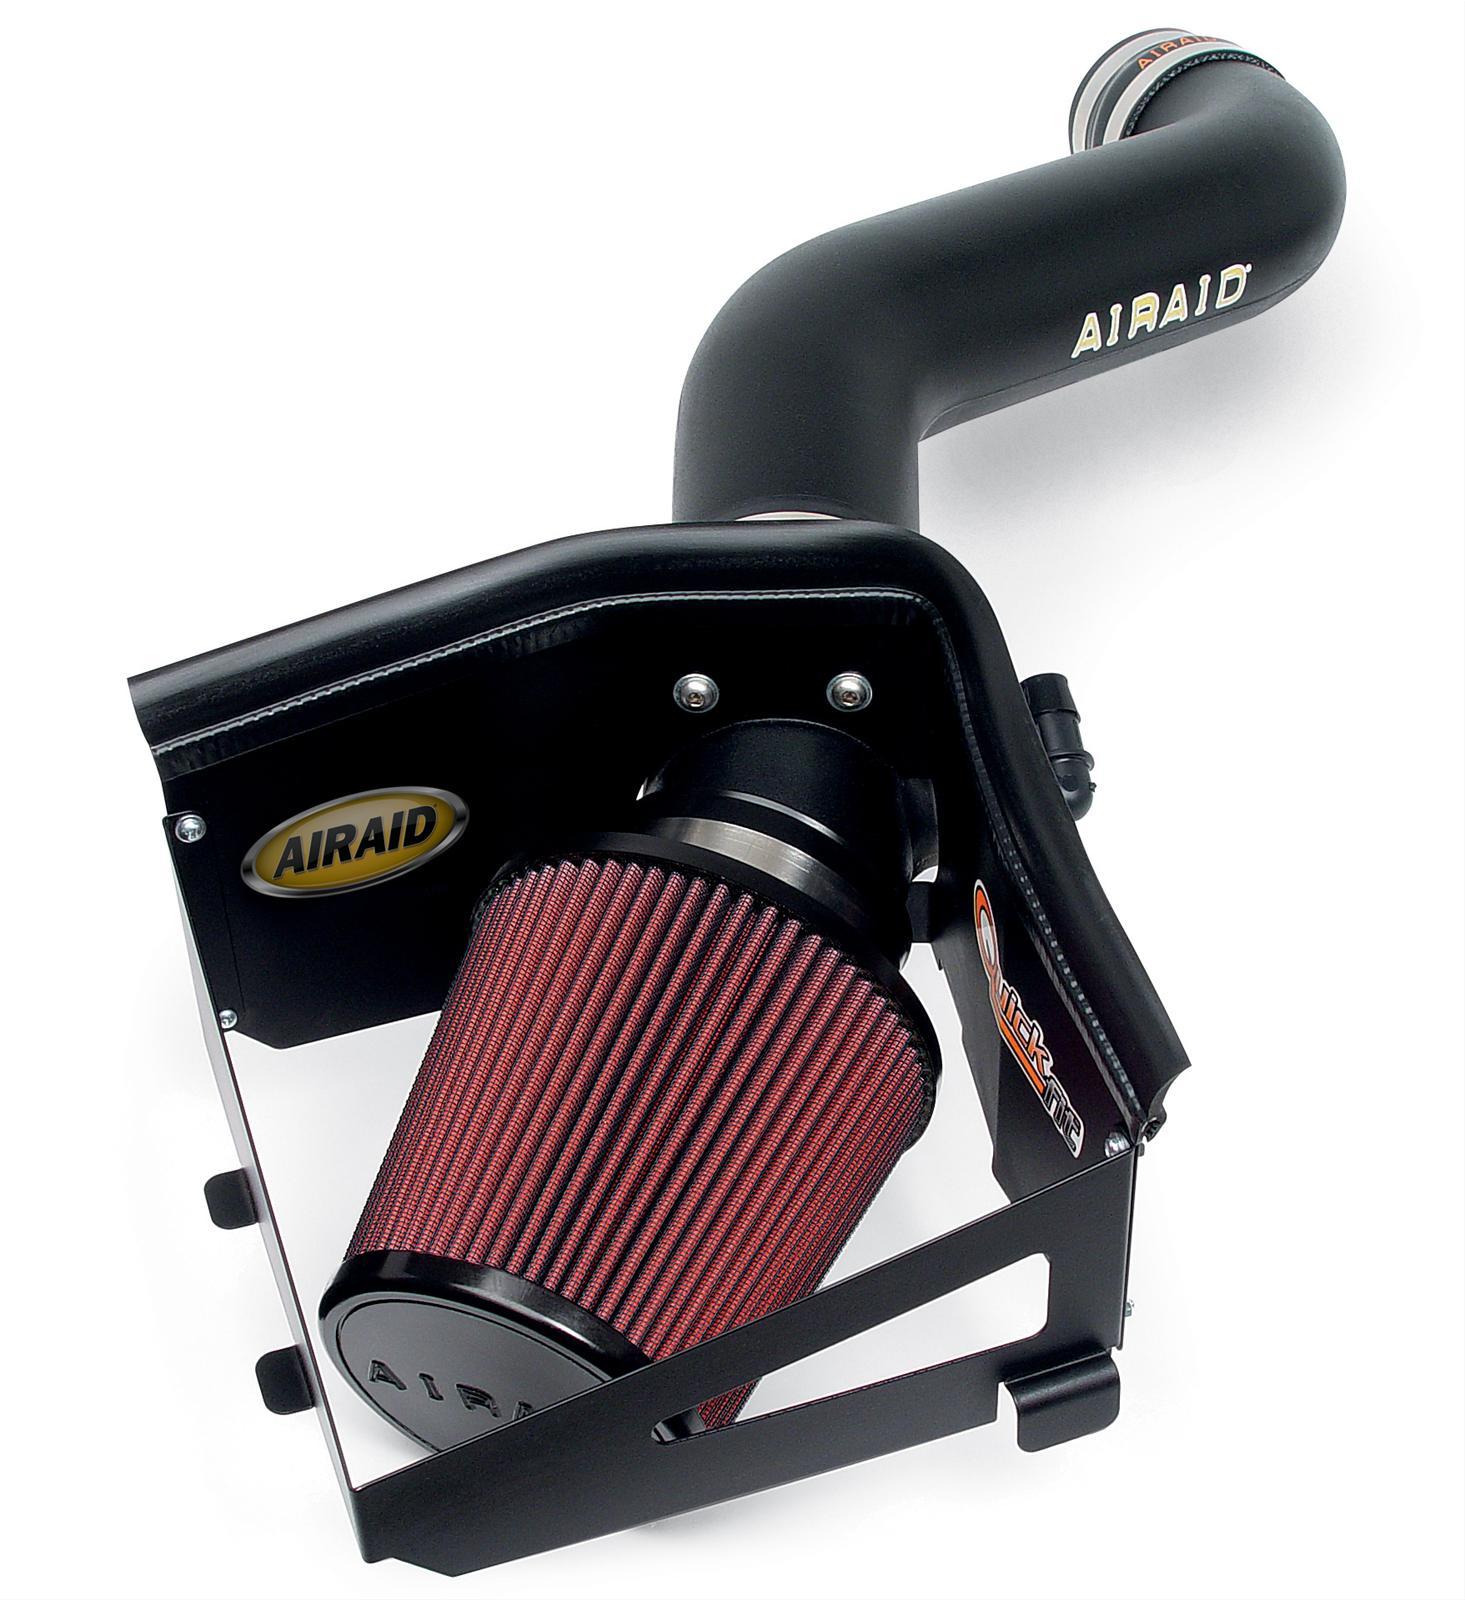 Airaid 300-117 Intake System